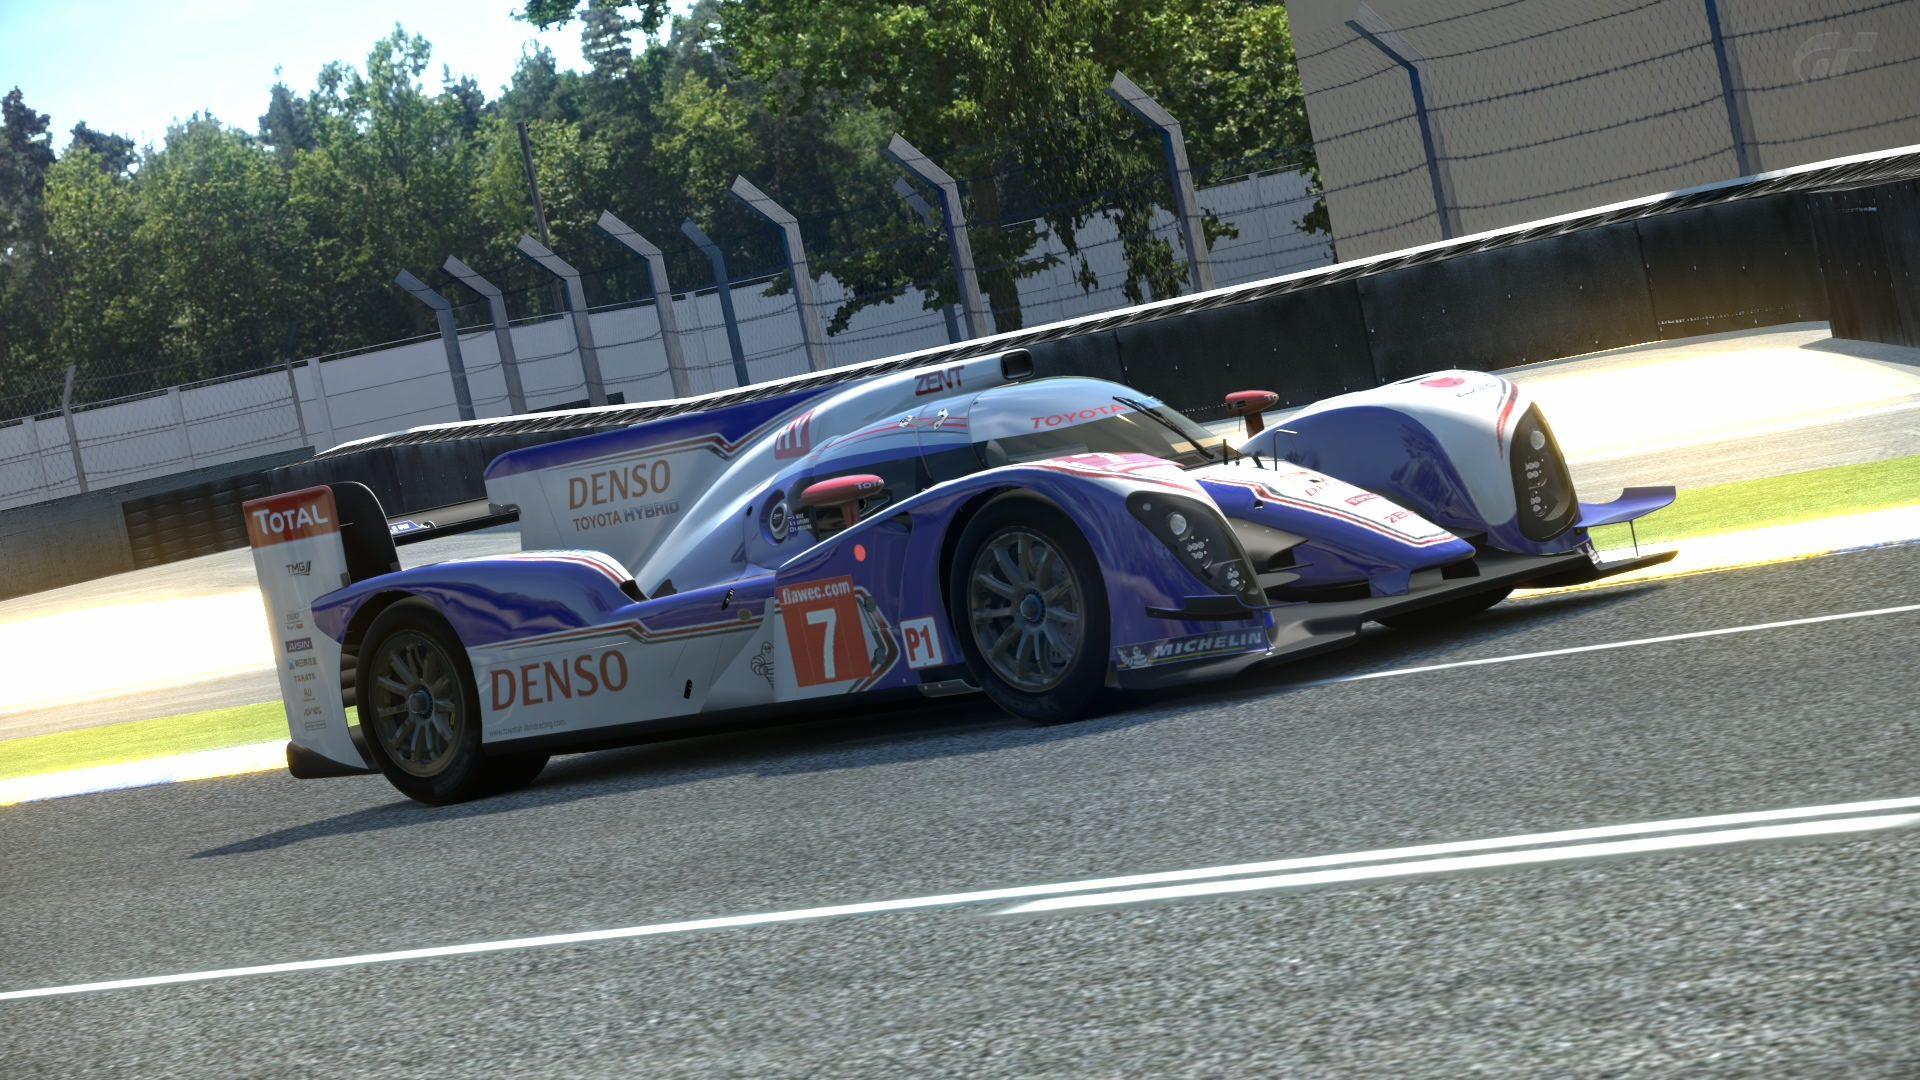 Circuit de la Sarthe 2013_1 (2).jpg